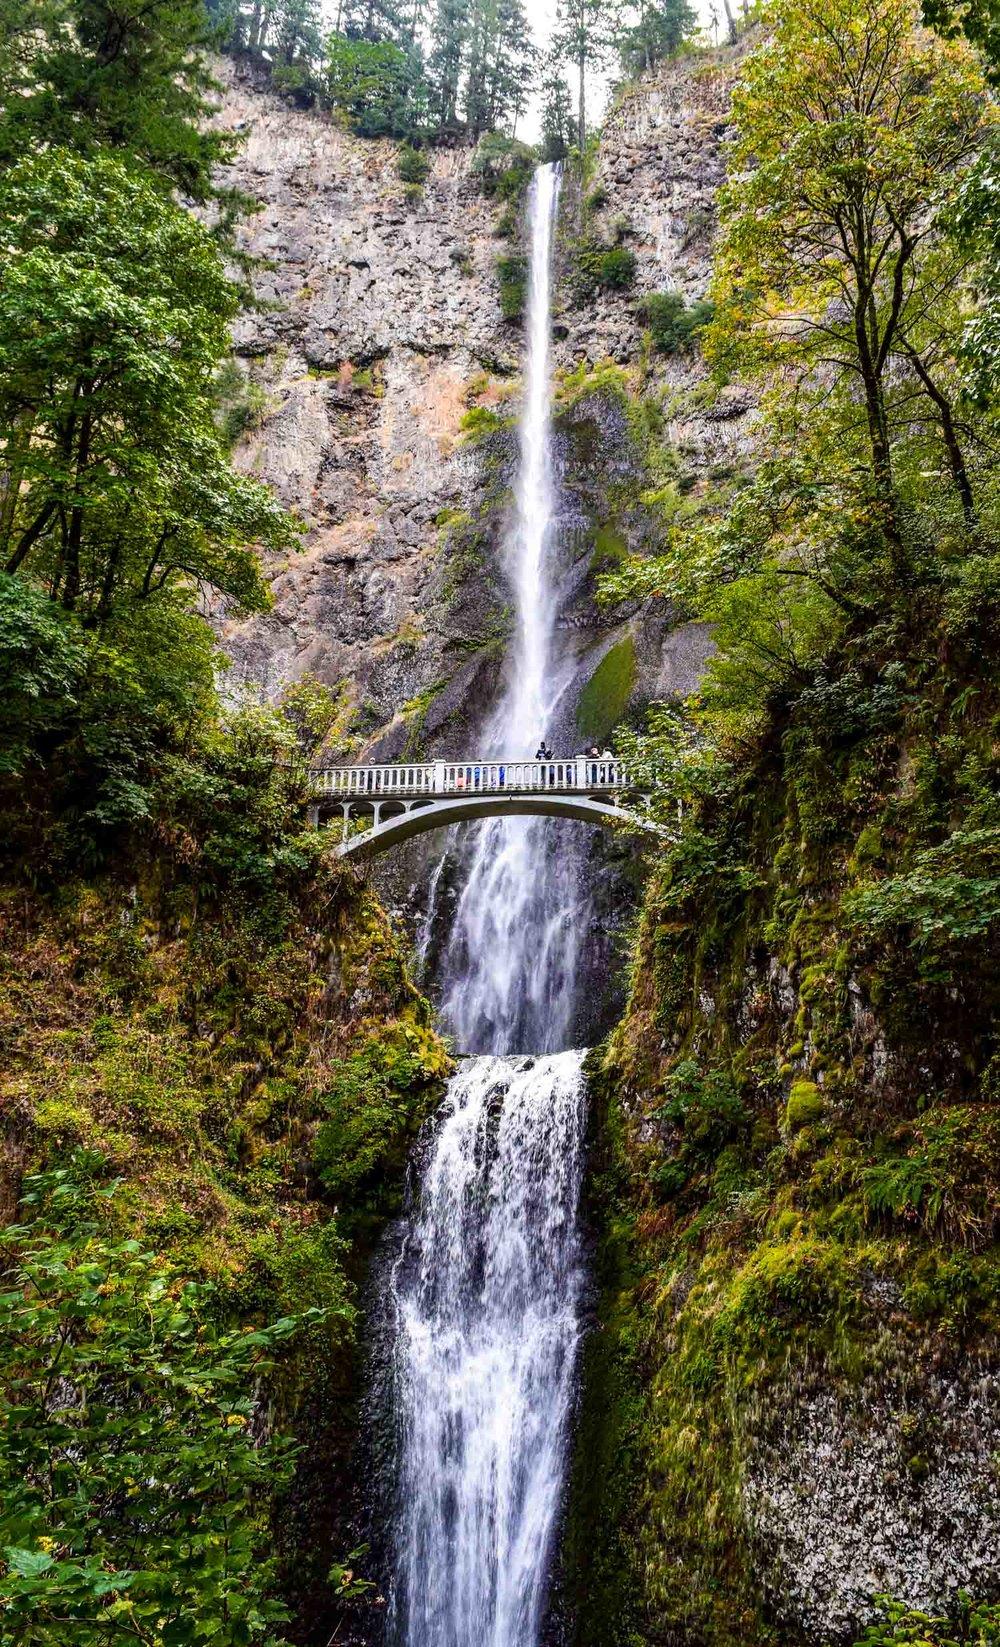 Multnomah Falls is a waterfall in the Columbia River Gorge, near Portland in Oregon, USA.